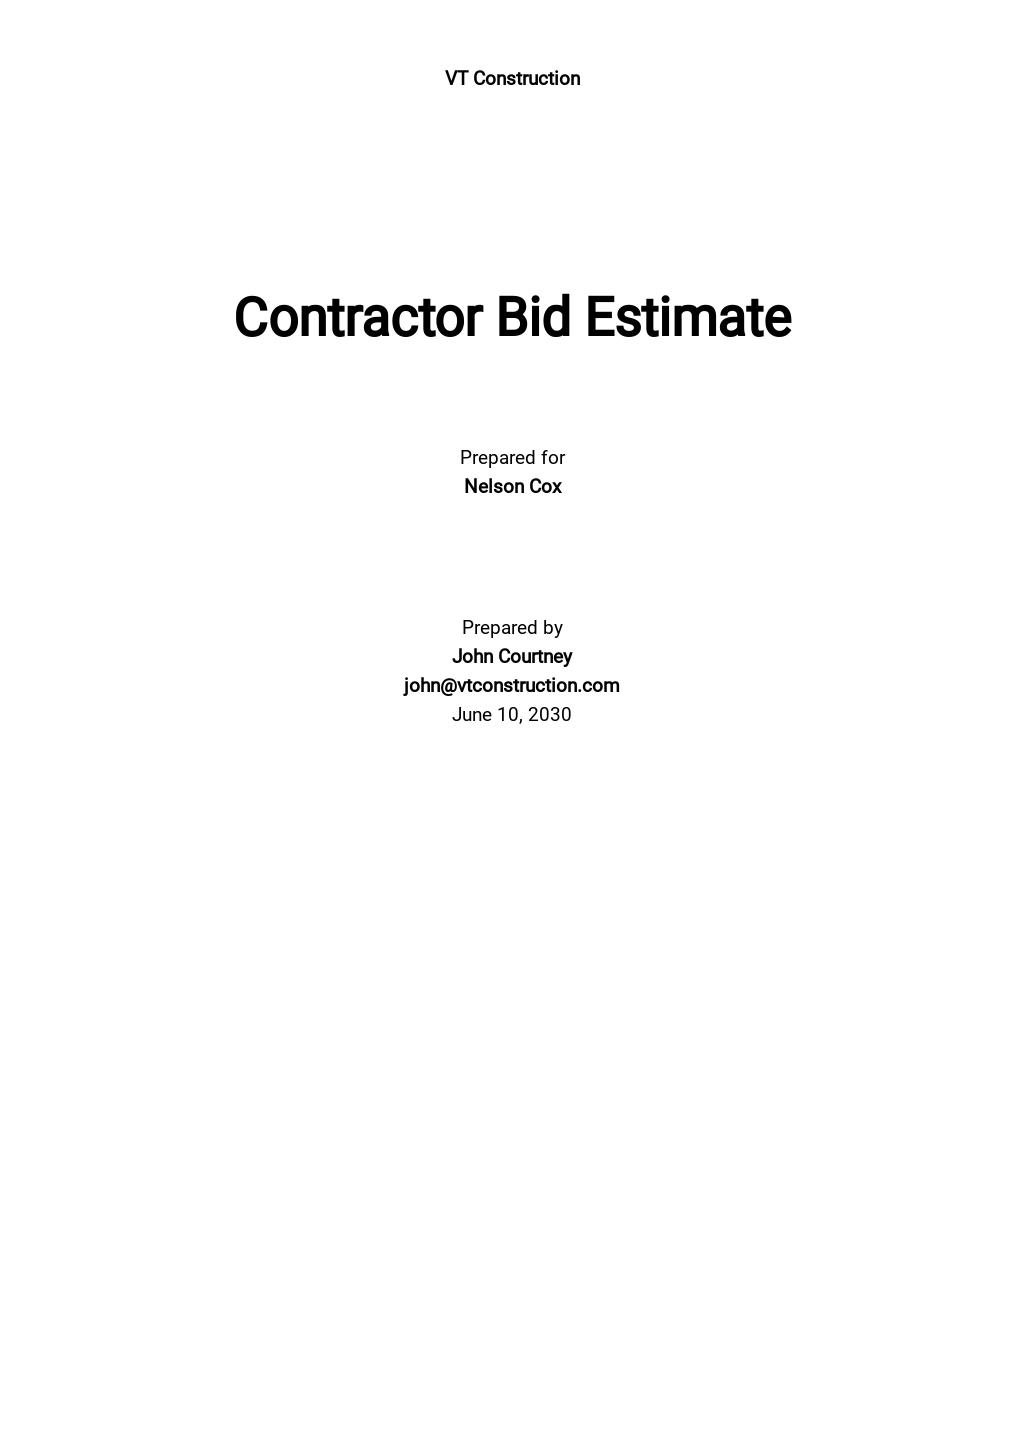 Free Contractor Bid Estimate Template.jpe